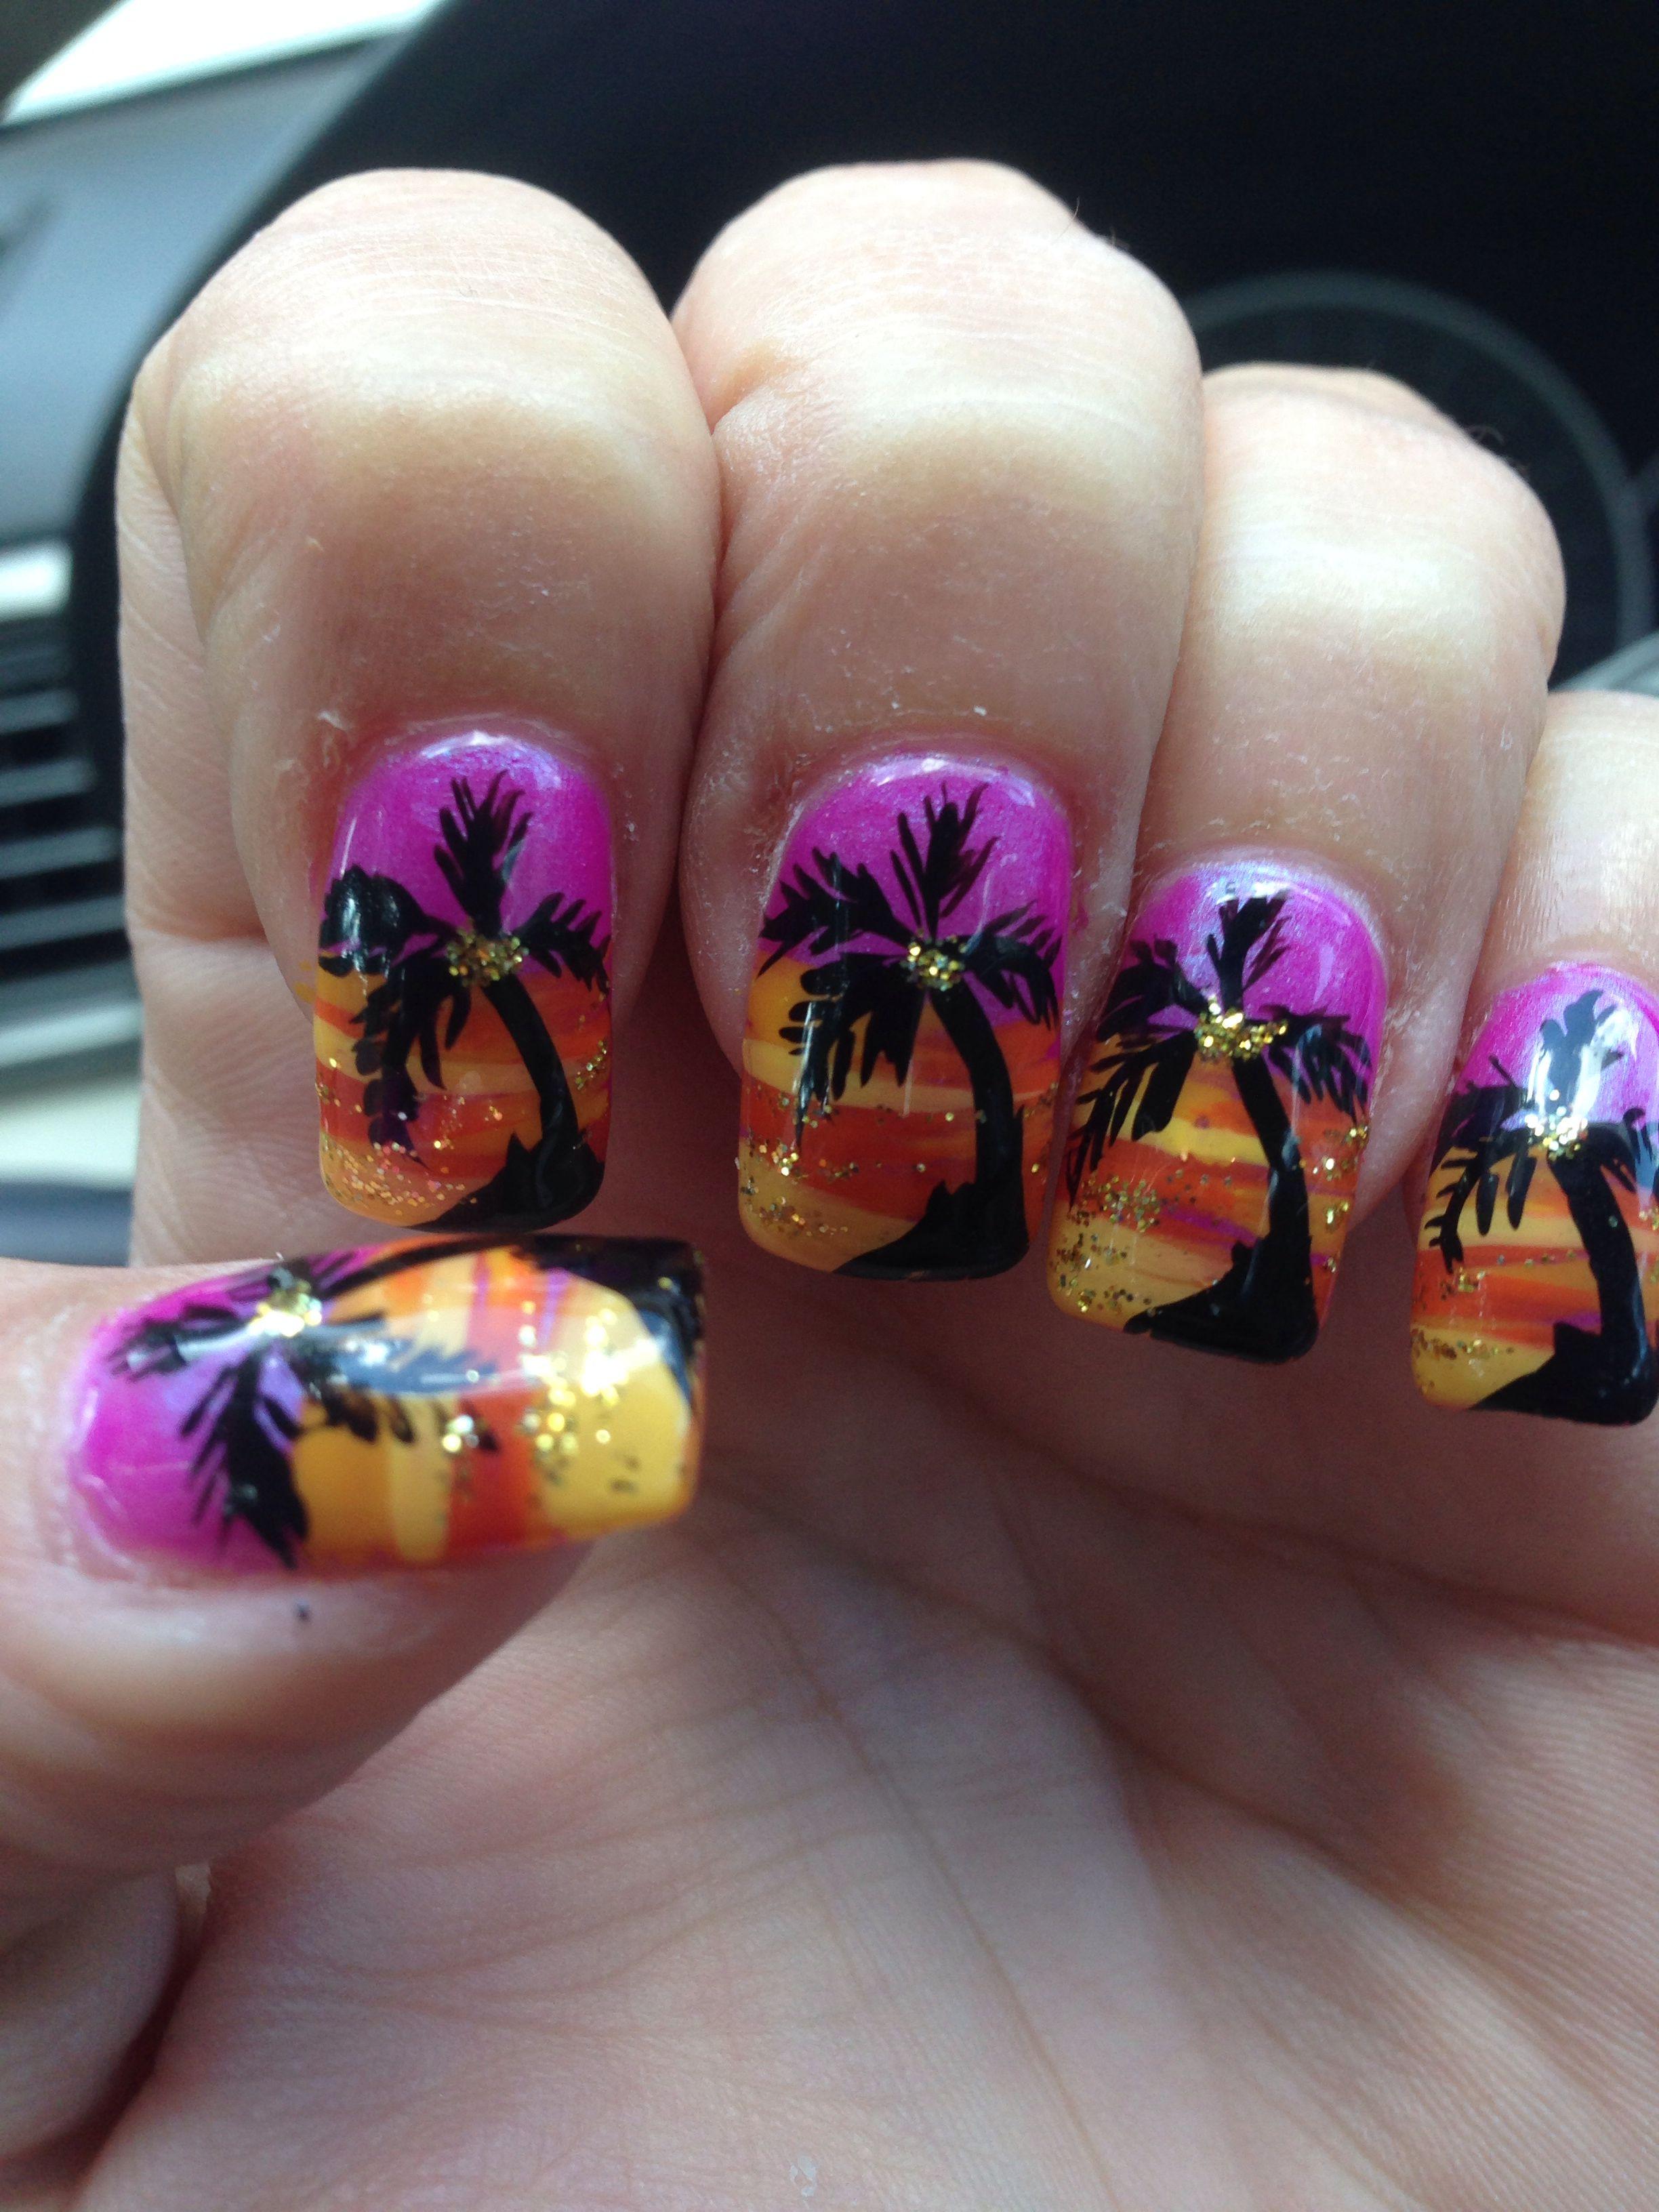 Fantastic nail art by Christine at Glamour Nails!! My favorite nails ...